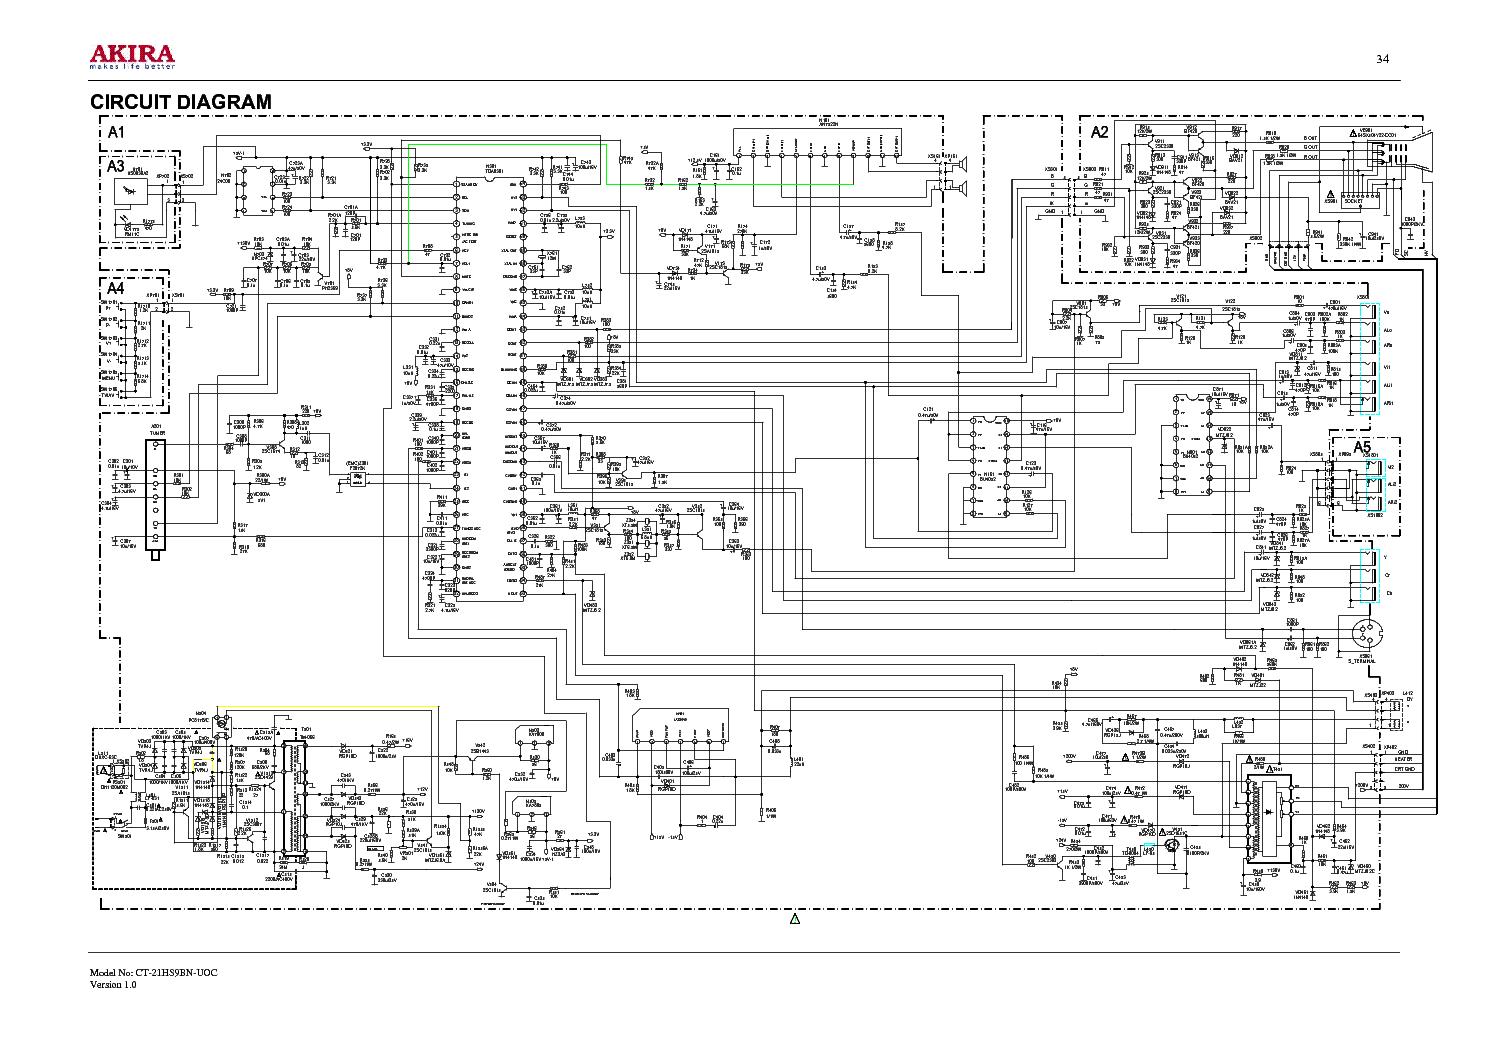 akira ct-21dx9a ss1 эл схема